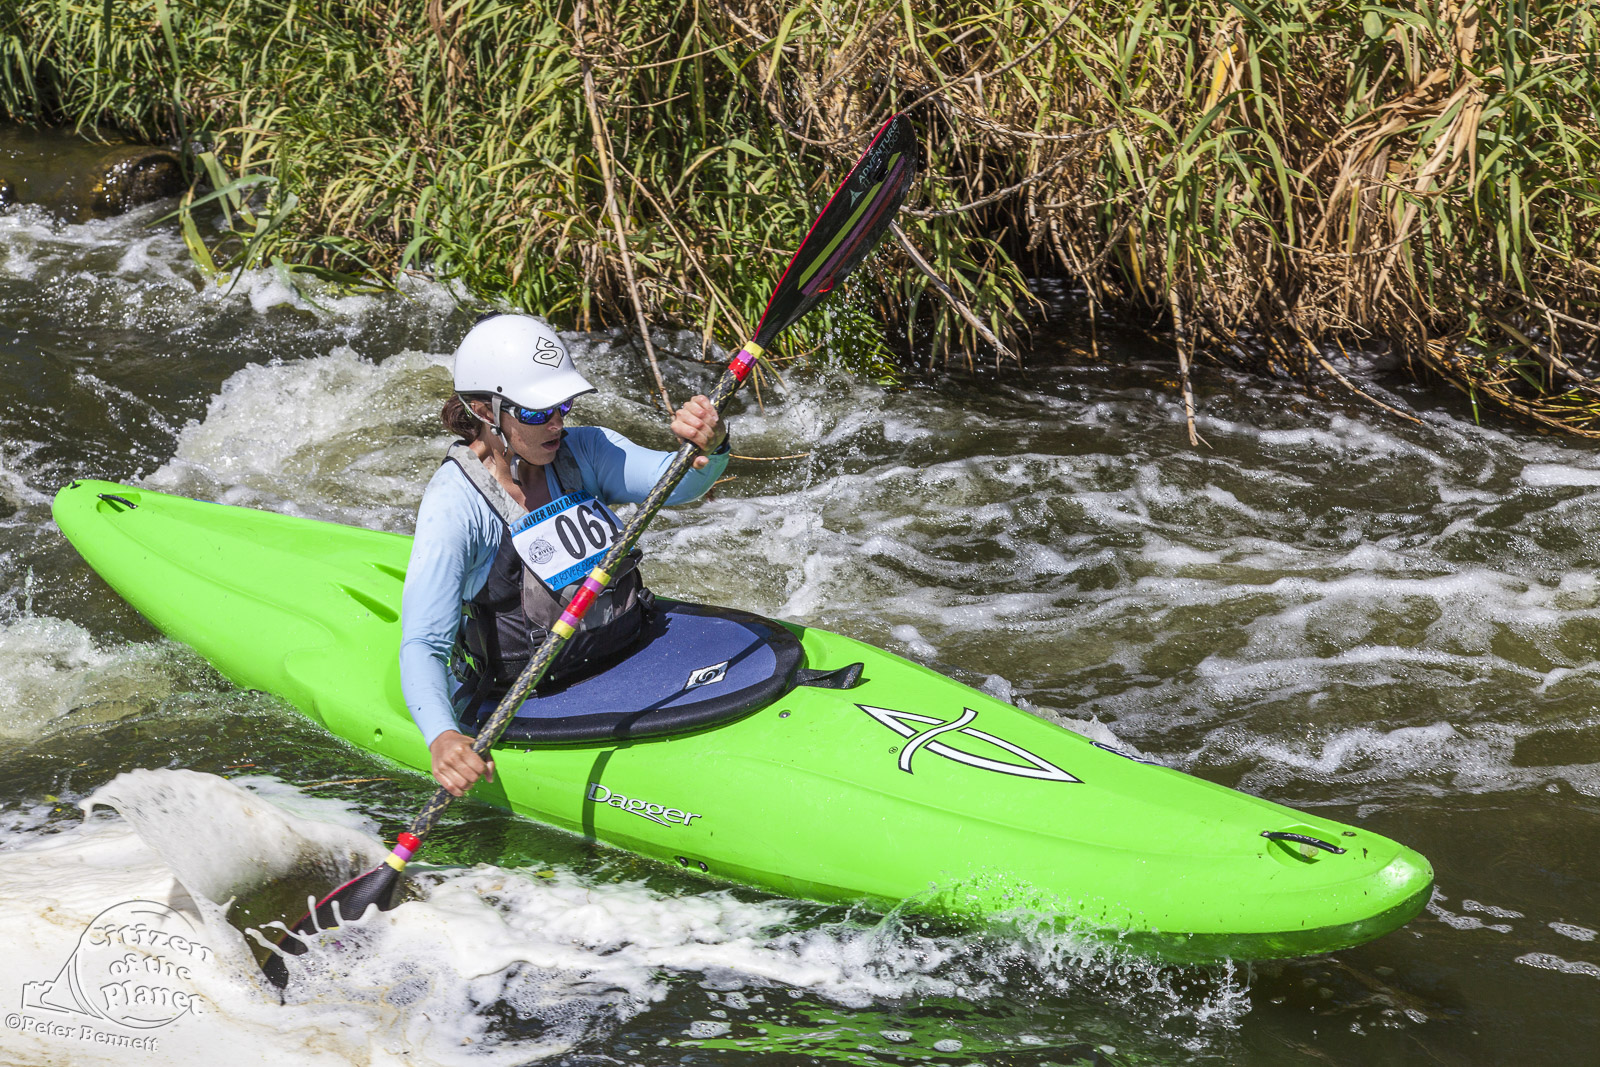 US_CA_48_3847_la_river_boat_race.jpg